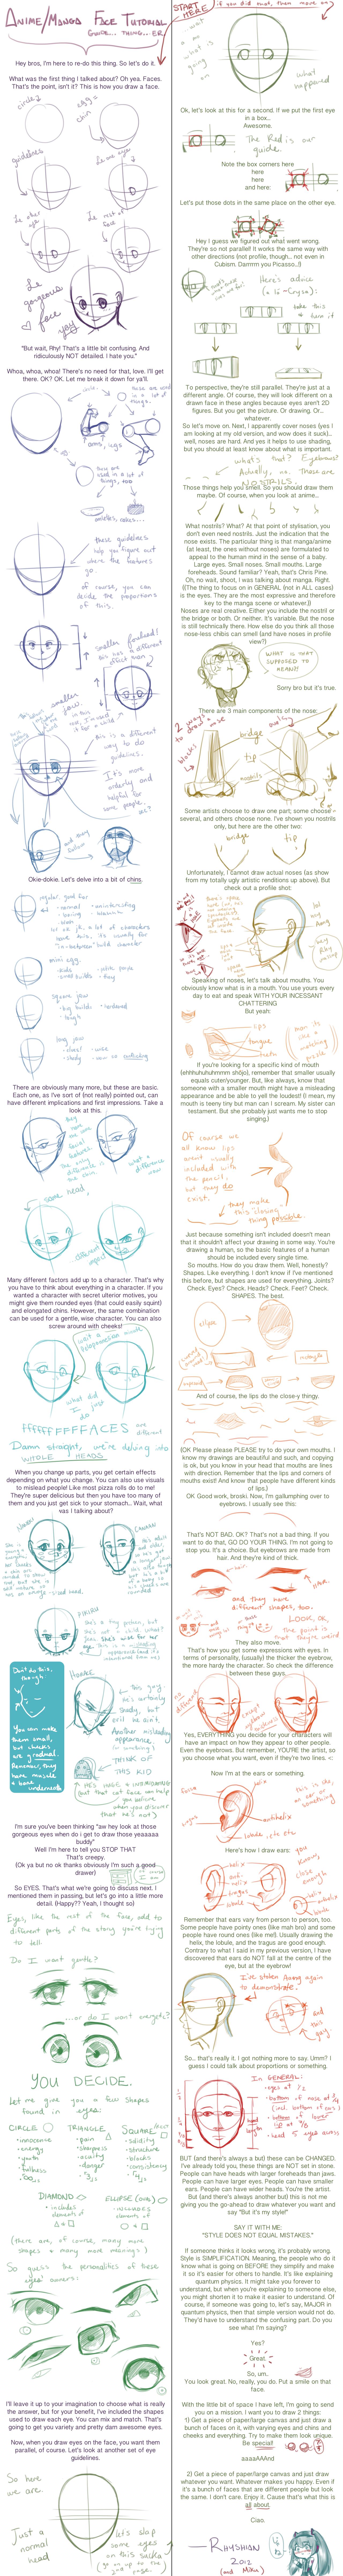 Face/Head Tutorial (Anime/Manga) v.2.0.3 by Rhyshian